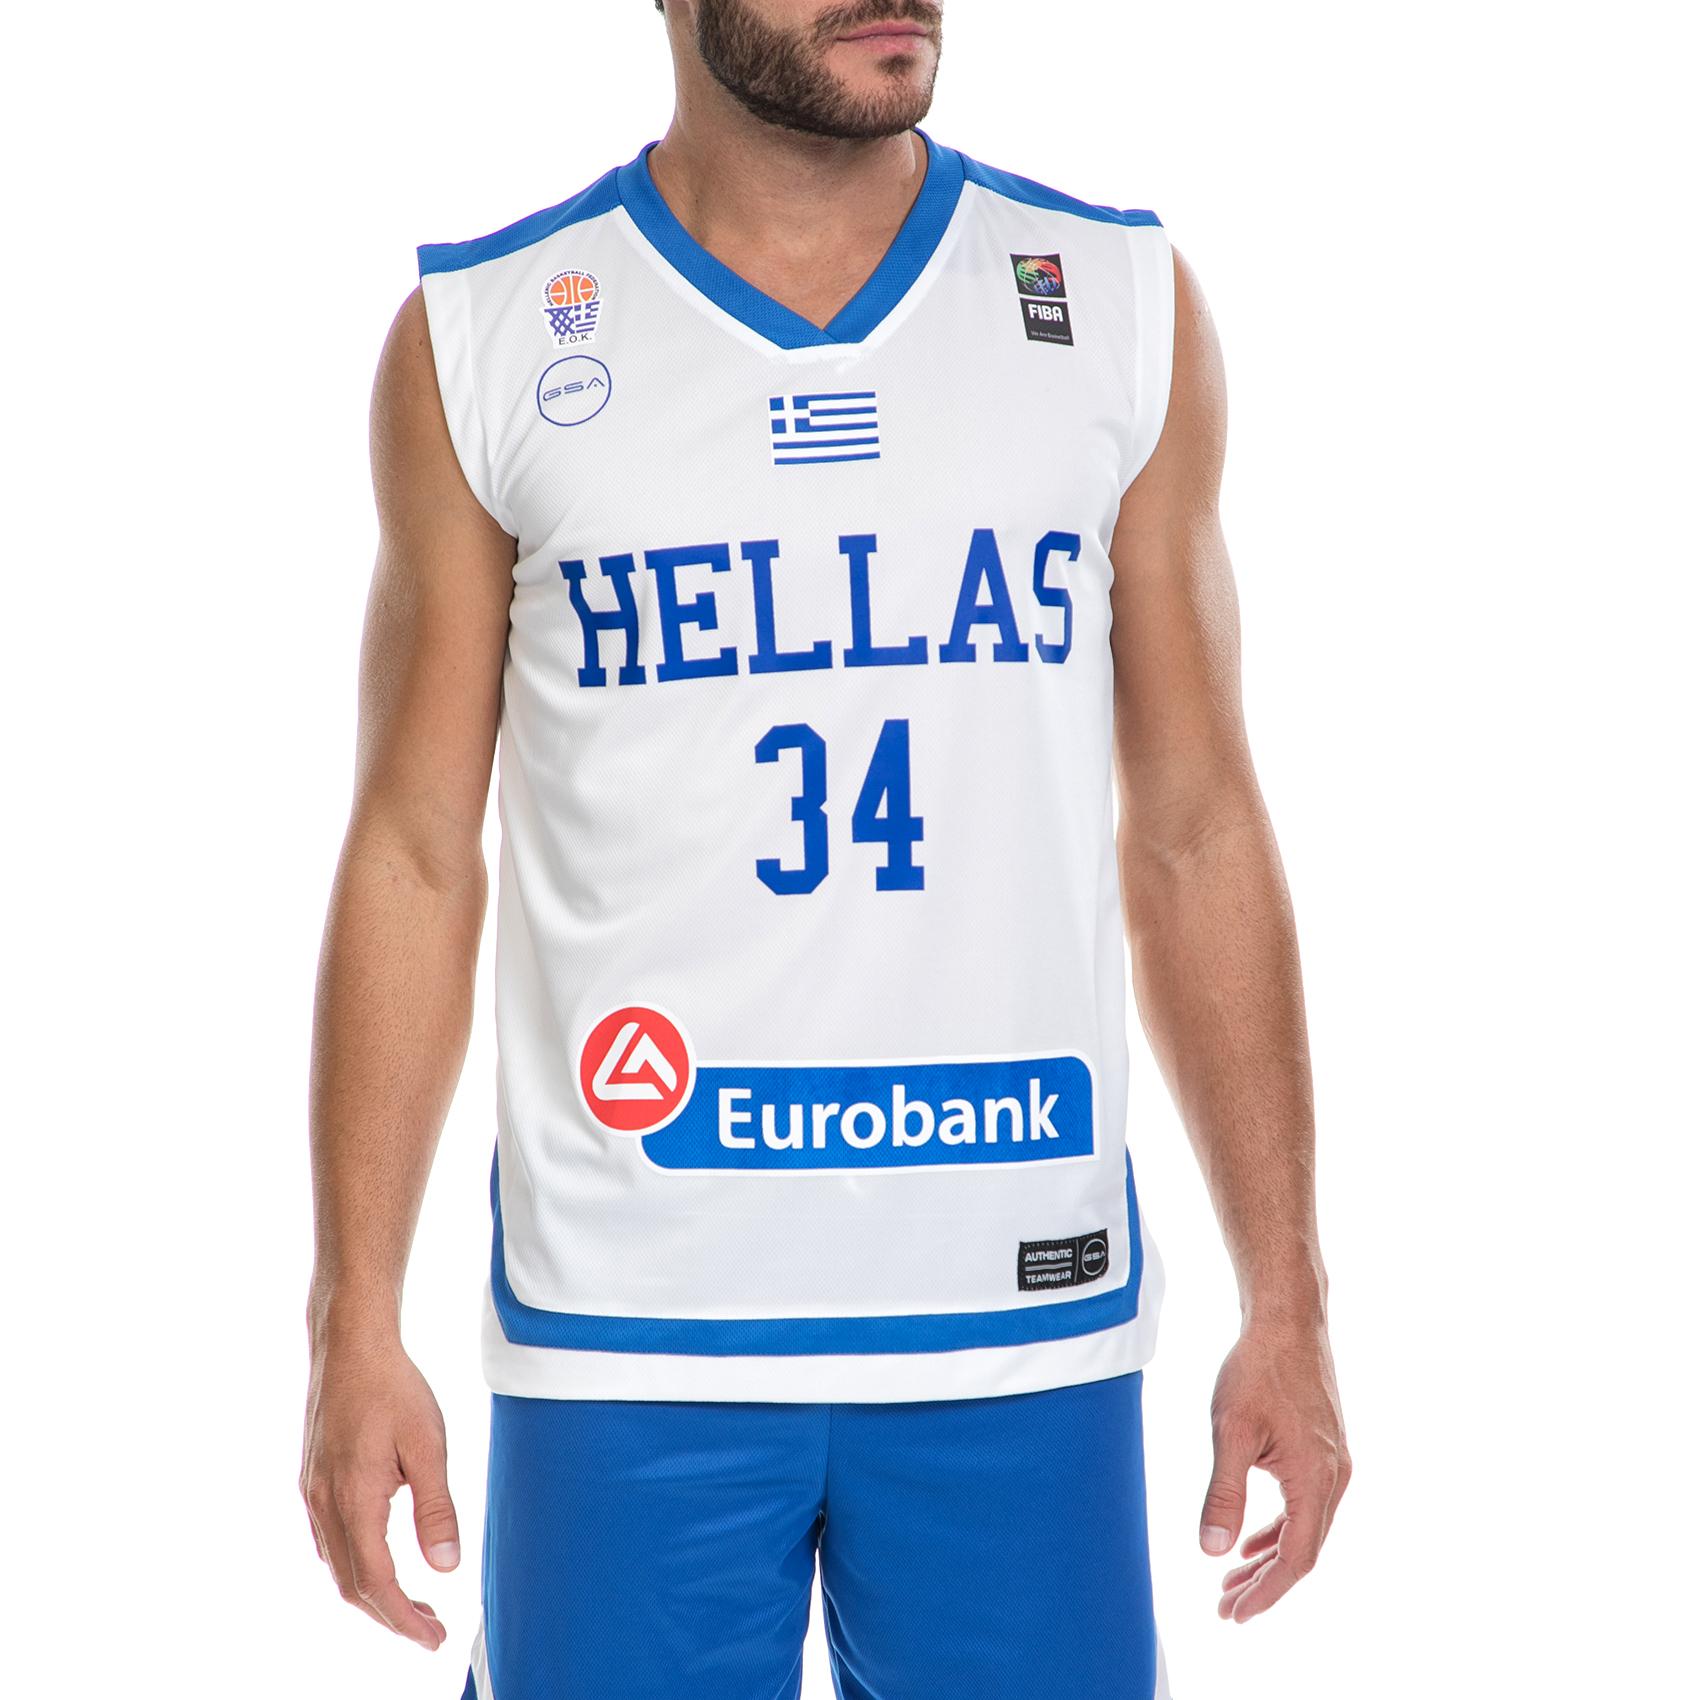 GSA - Ανδρική μπλούζα της Εθνικής Ελλάδος Basket ΑΝΤΕΤΟΚΟΥΜΠΟ Γ. λευκή ανδρικά ρούχα αθλητικά t shirt